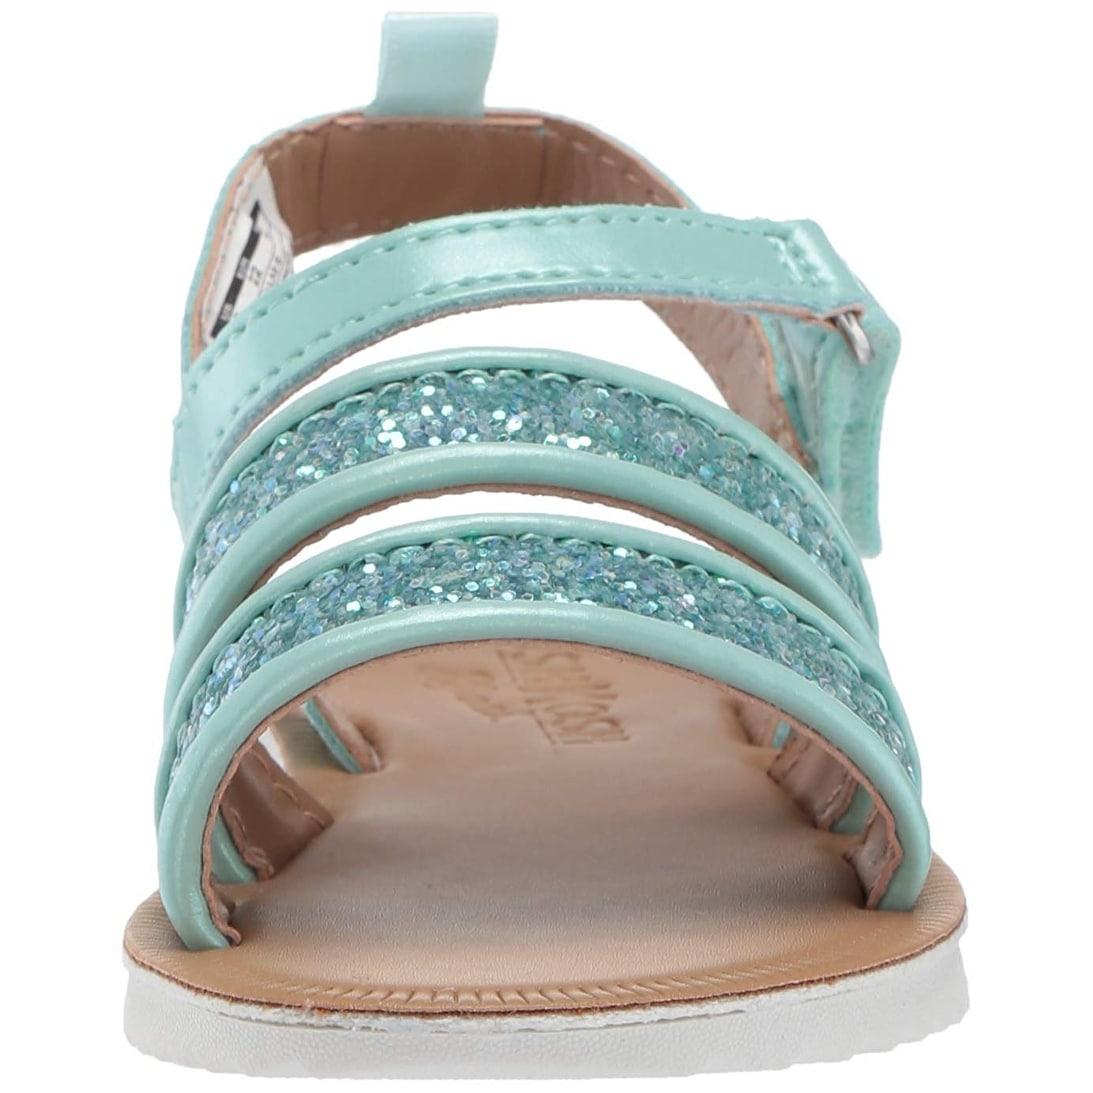 OshKosh BGosh Toddler and Little Girls Stella Fashion Sandal